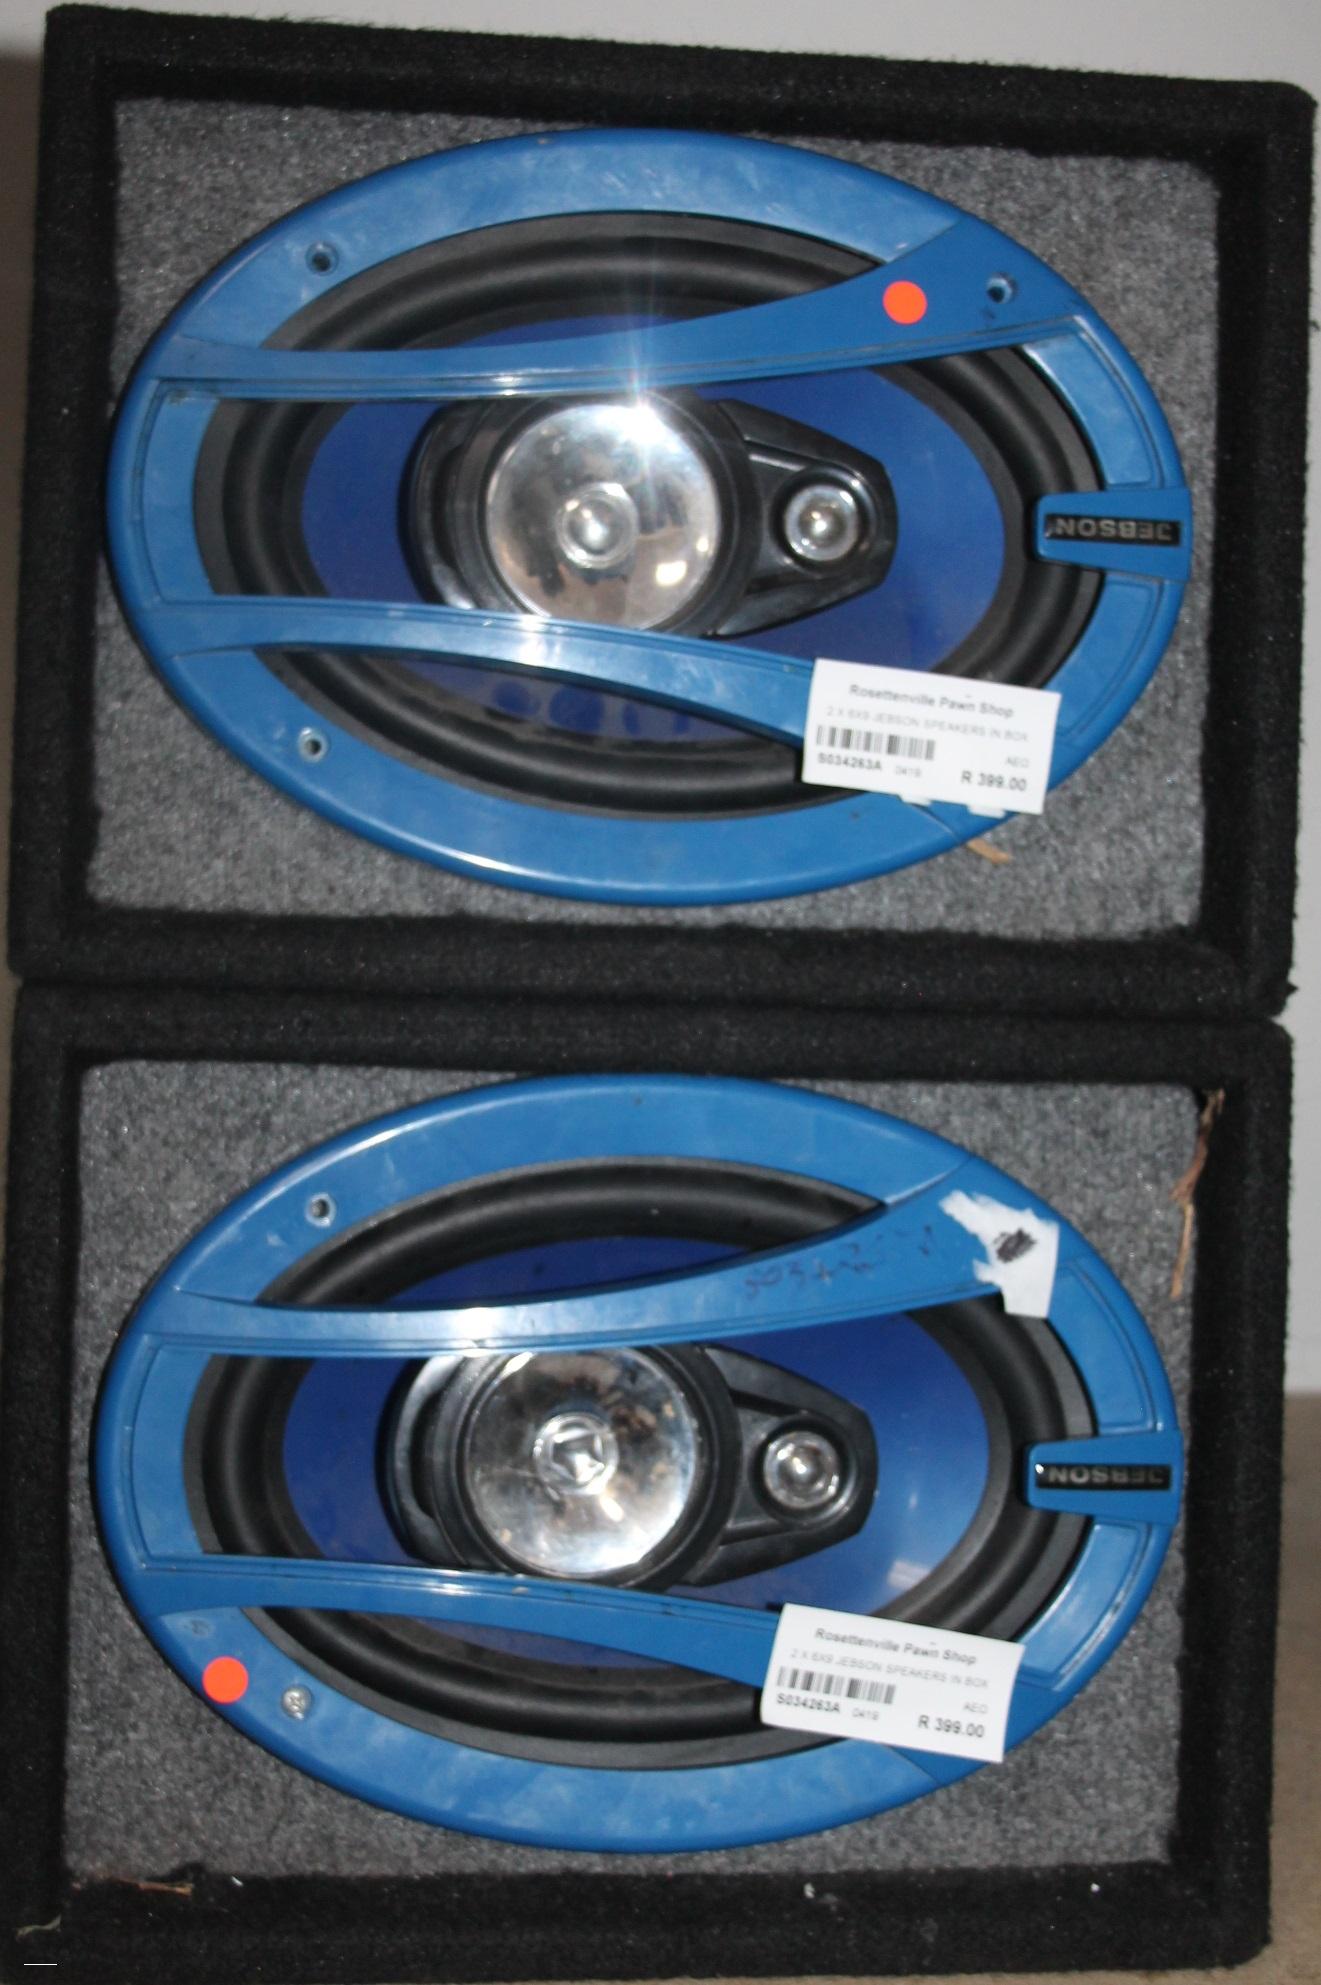 S034263A 2 X 6x9 Jebson speakers #Rosettenvillepawnshop